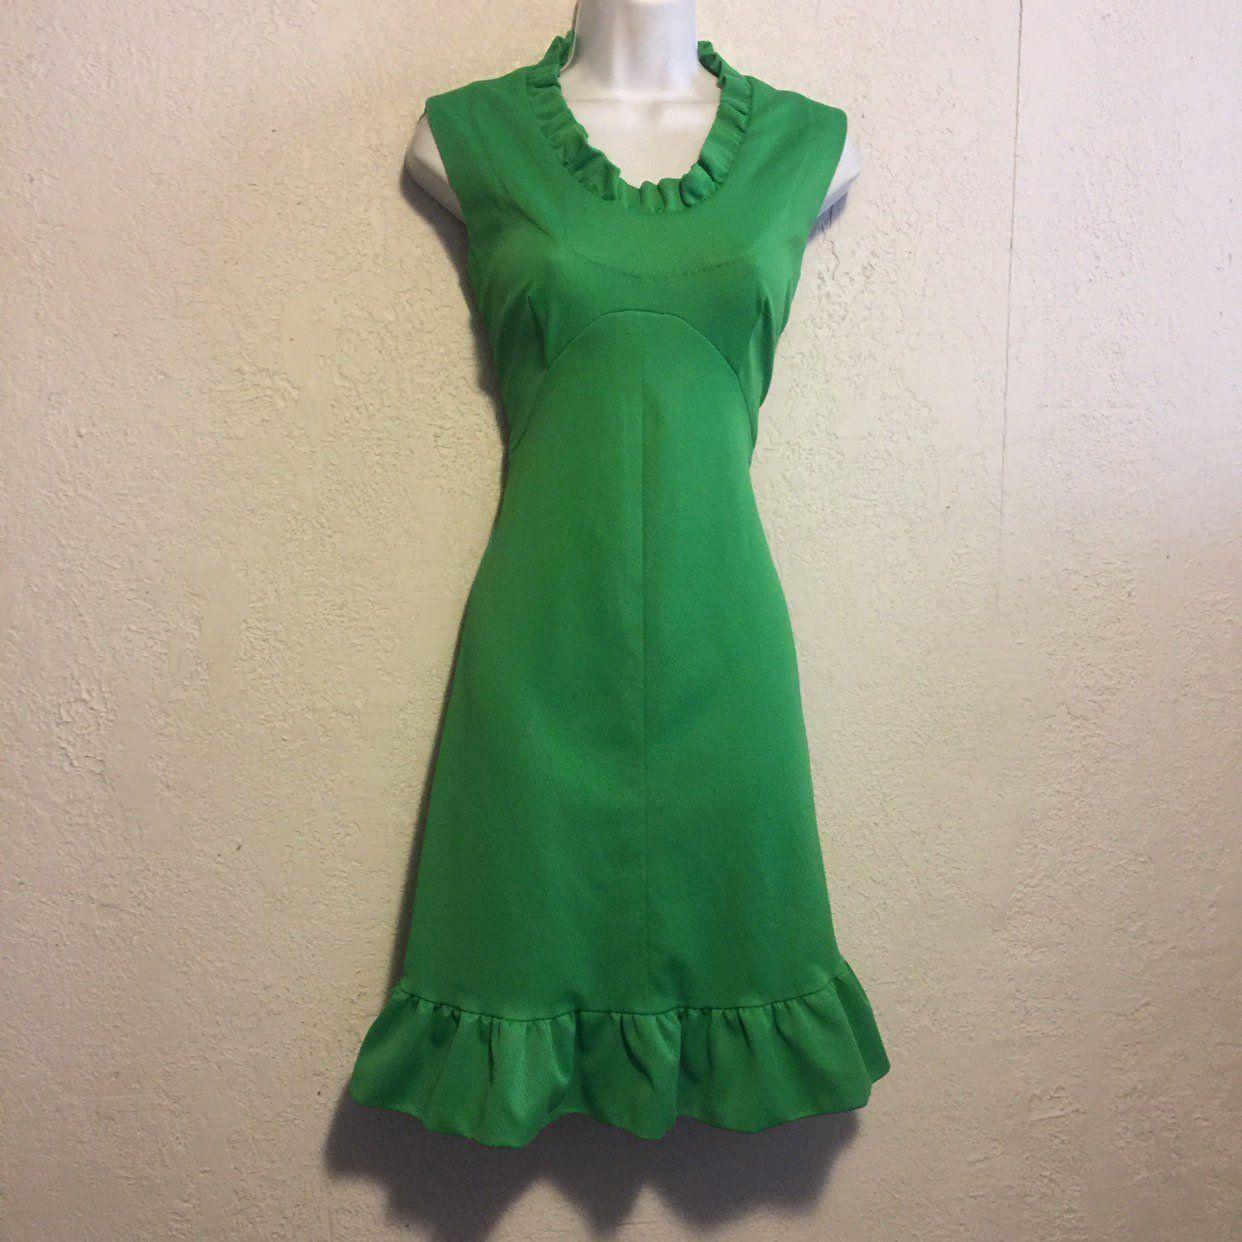 Bright Lime Green Vintage Ruffled Dress Etsy Ruffle Dress Dresses Halter Party Dress [ 1242 x 1242 Pixel ]